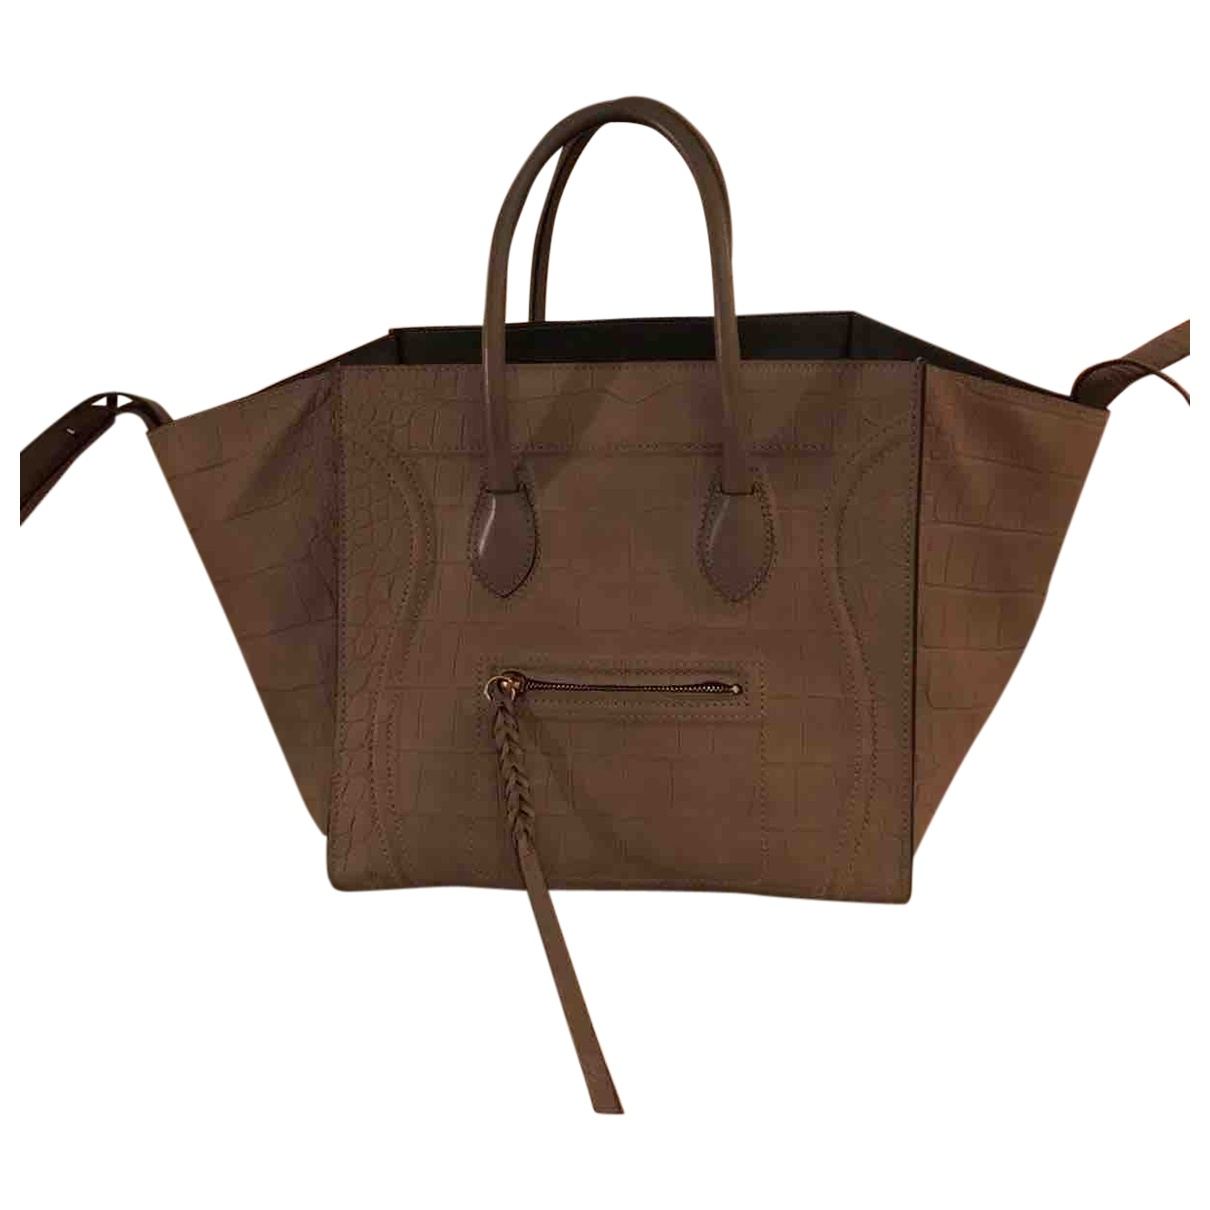 Celine - Sac a main Luggage Phantom pour femme en cuir - gris